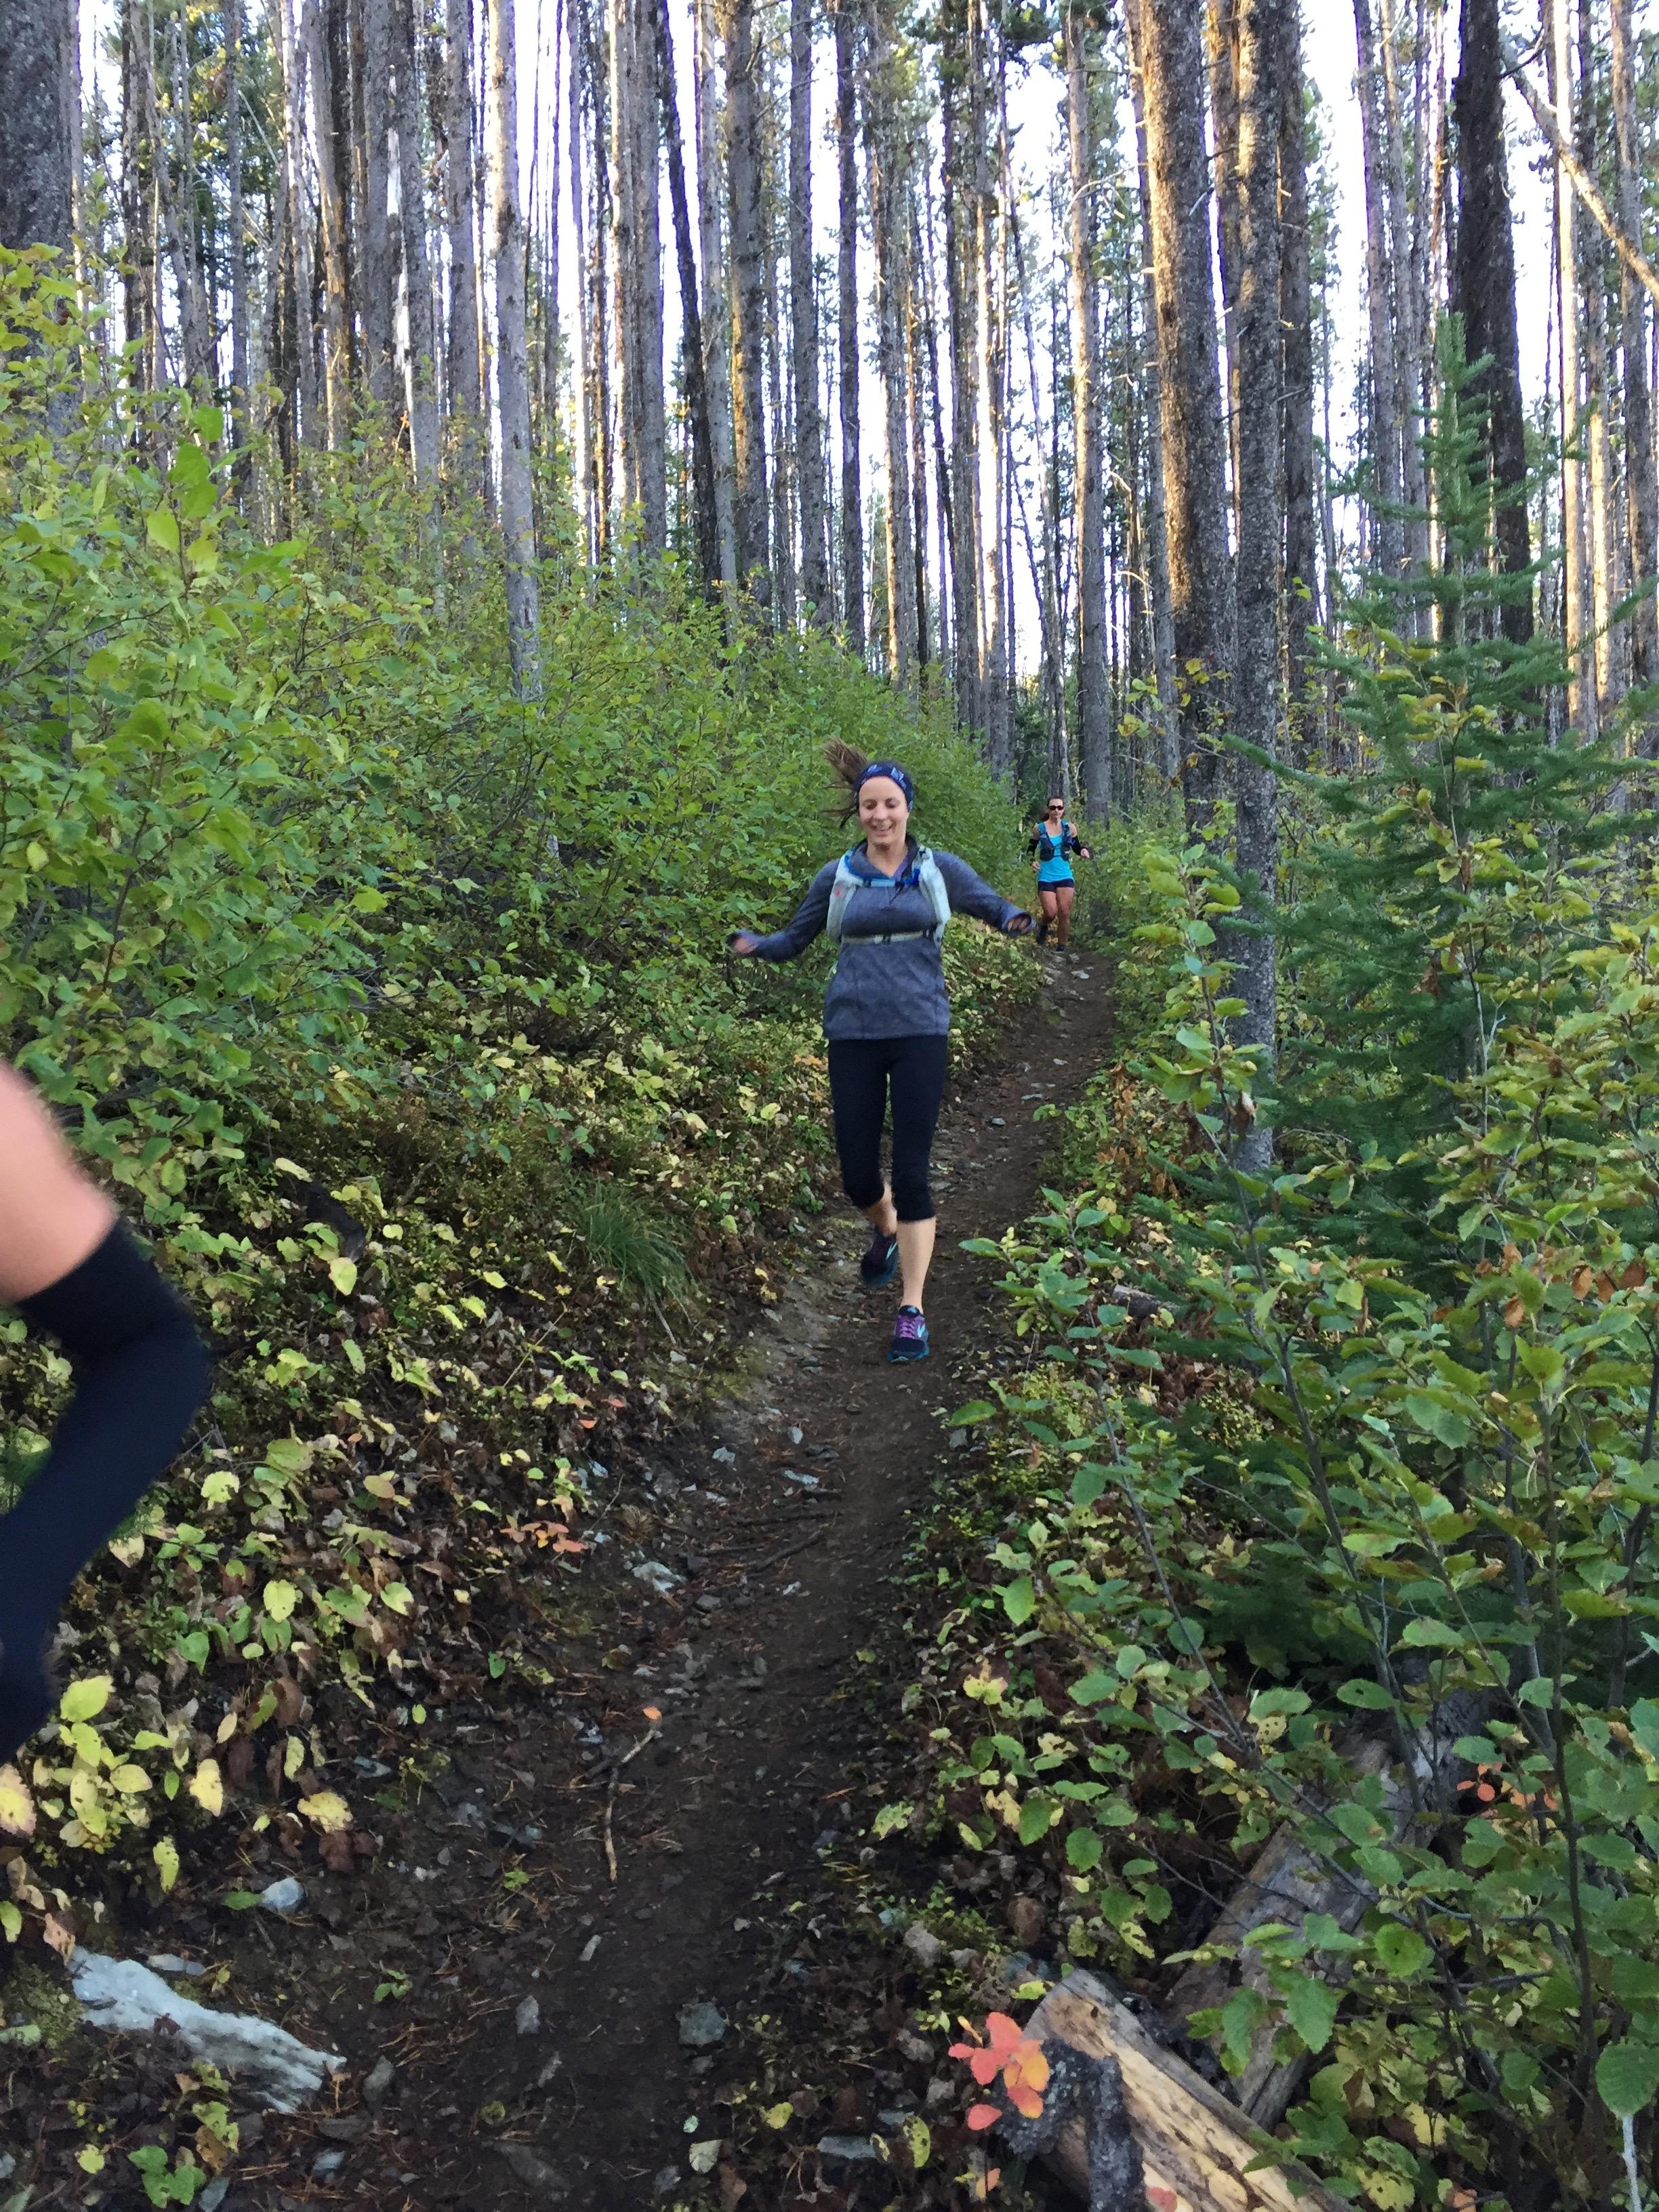 foys to blacktail trails trail marathon ftbtIMG_1052.JPG